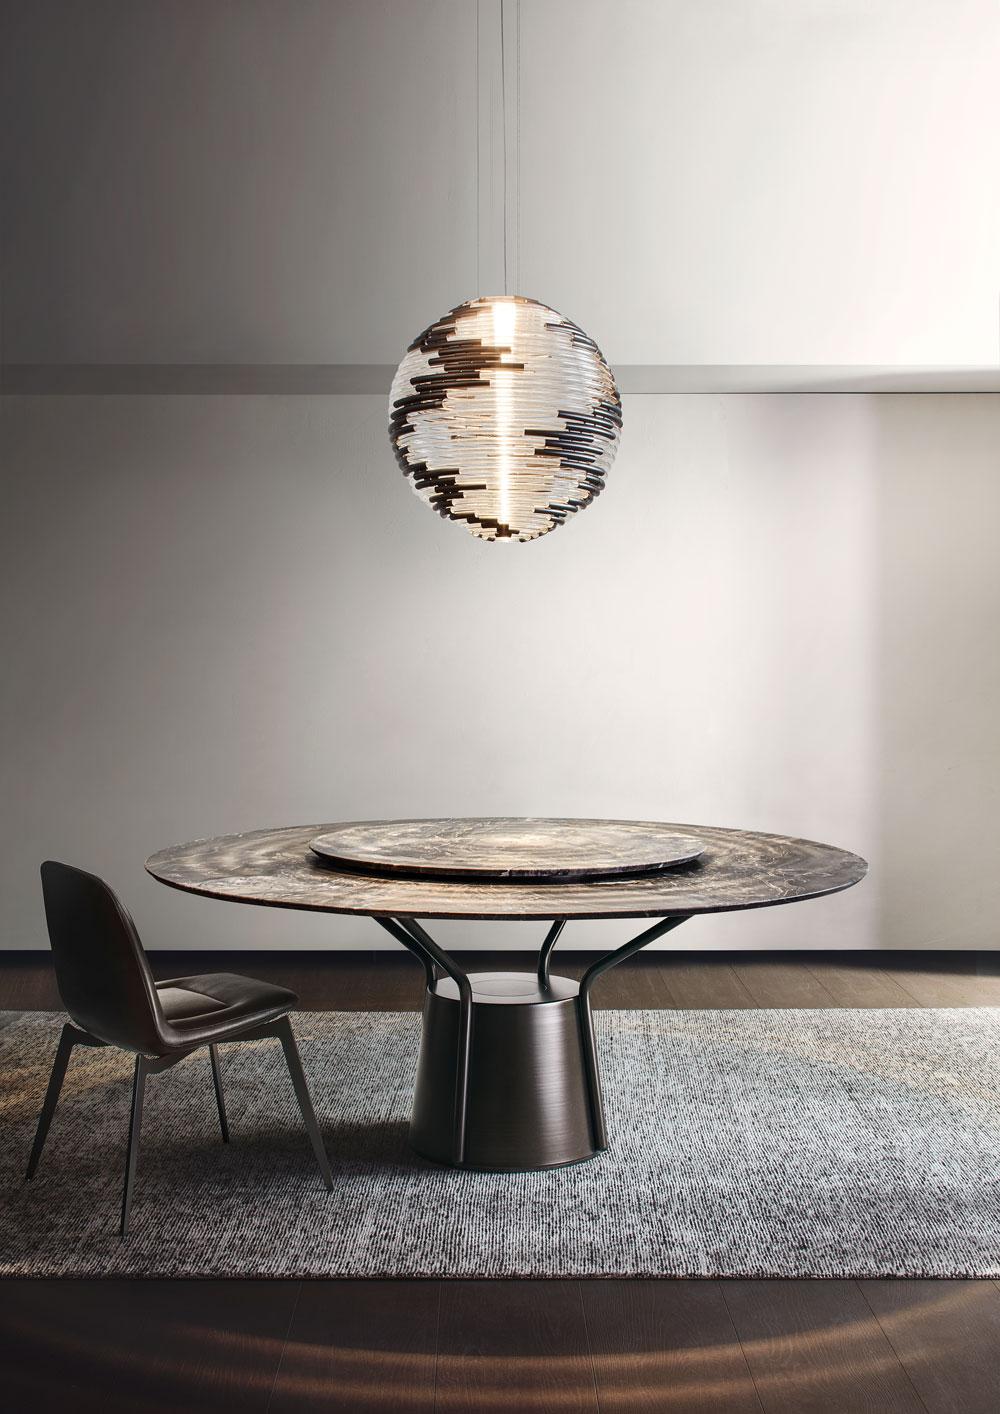 GEA_lamp-BALLOON_table